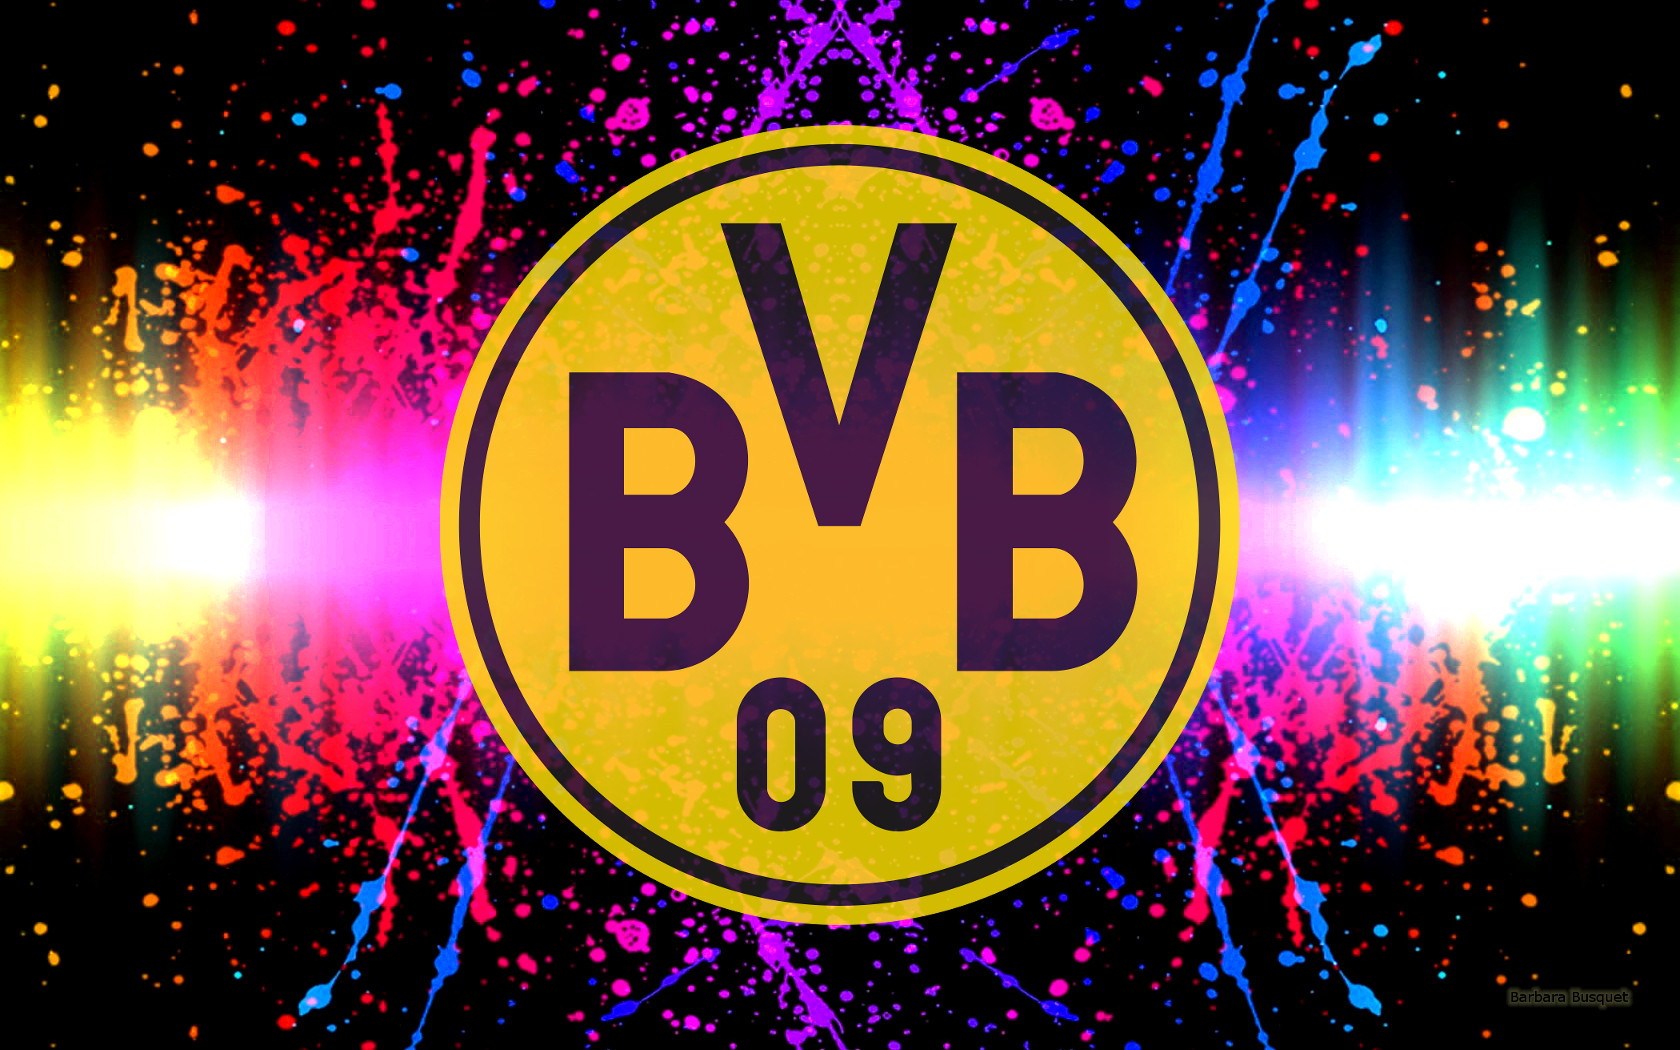 Borussia dortmund wallpapers barbaras hd wallpapers colorful borussia dortmund football club wallpaper voltagebd Choice Image